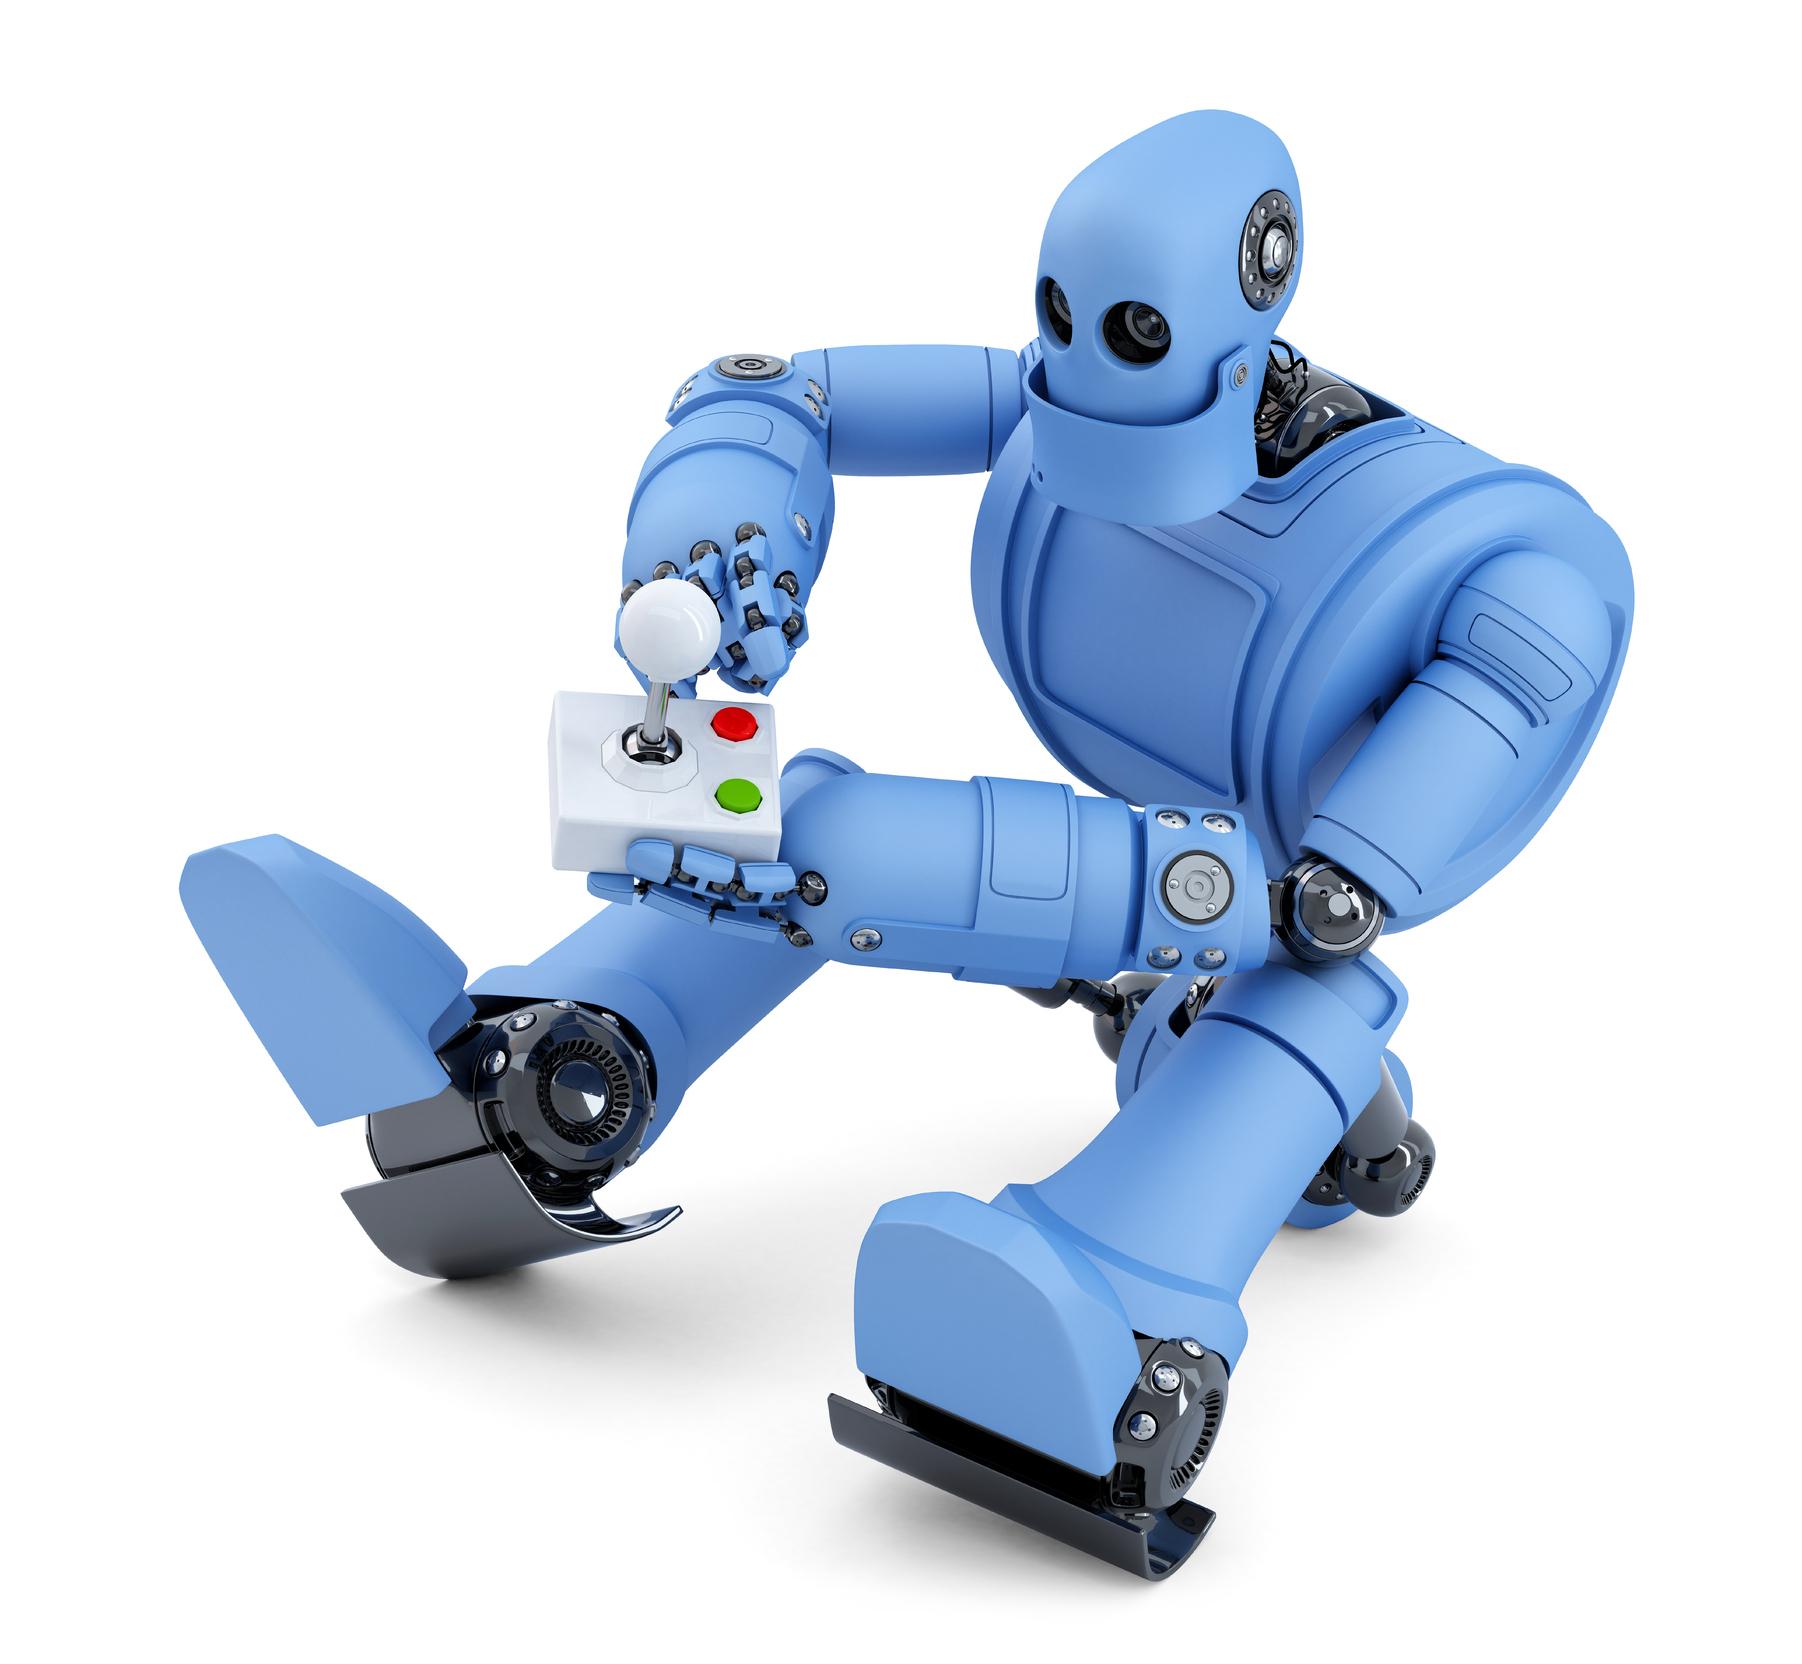 A blue robot holding a video game controller